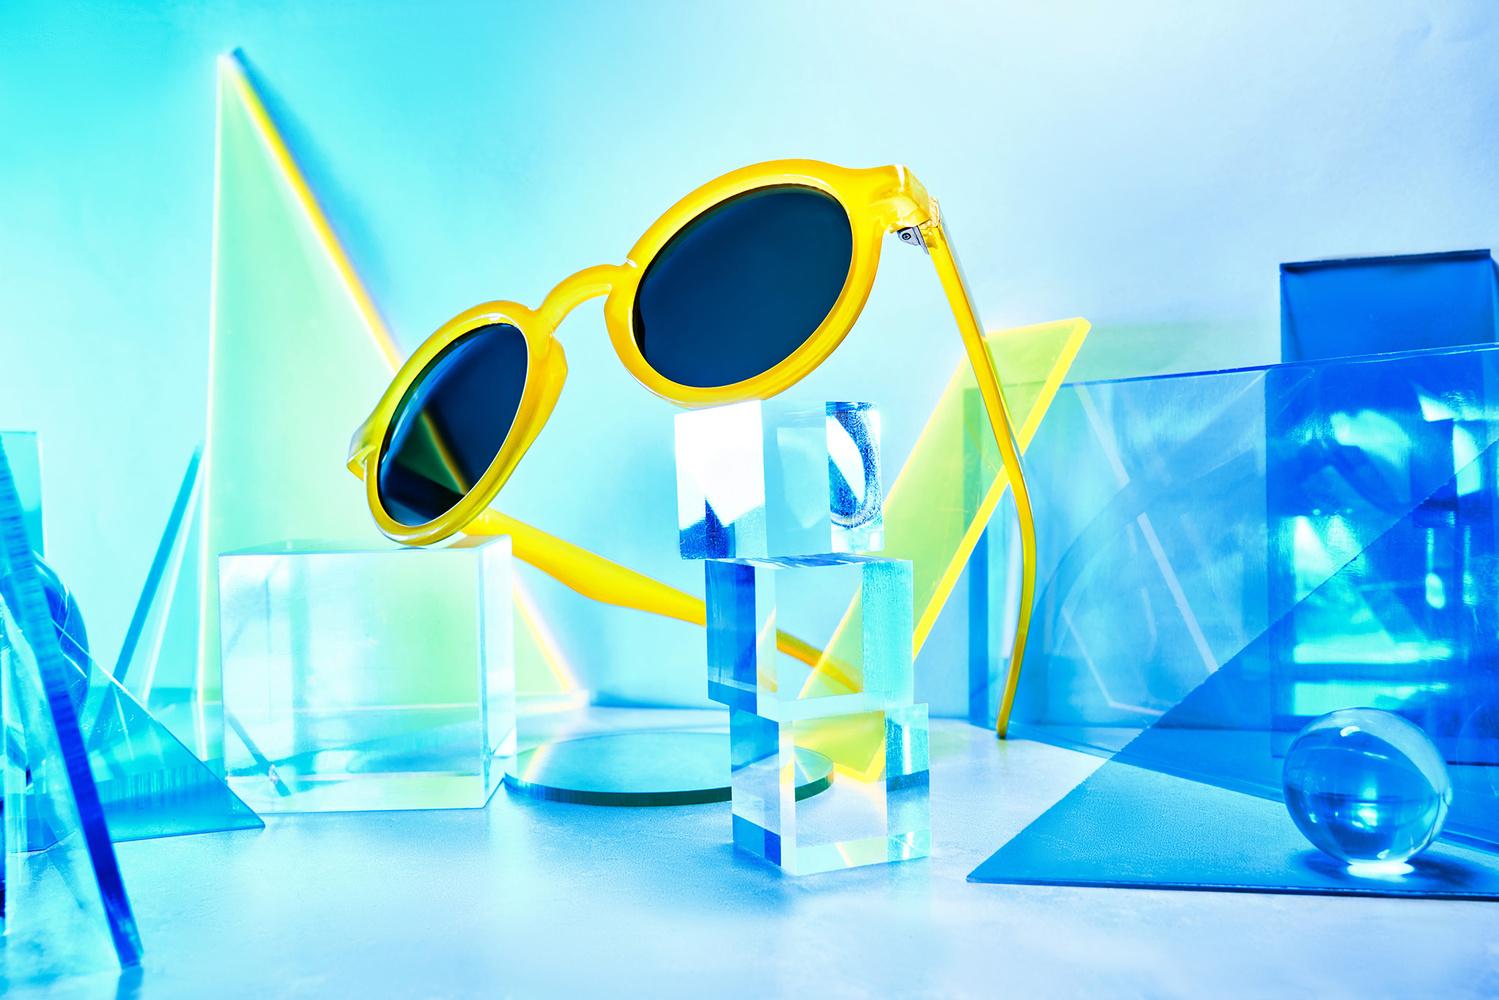 Sunglasses by Dmitry Bocharov